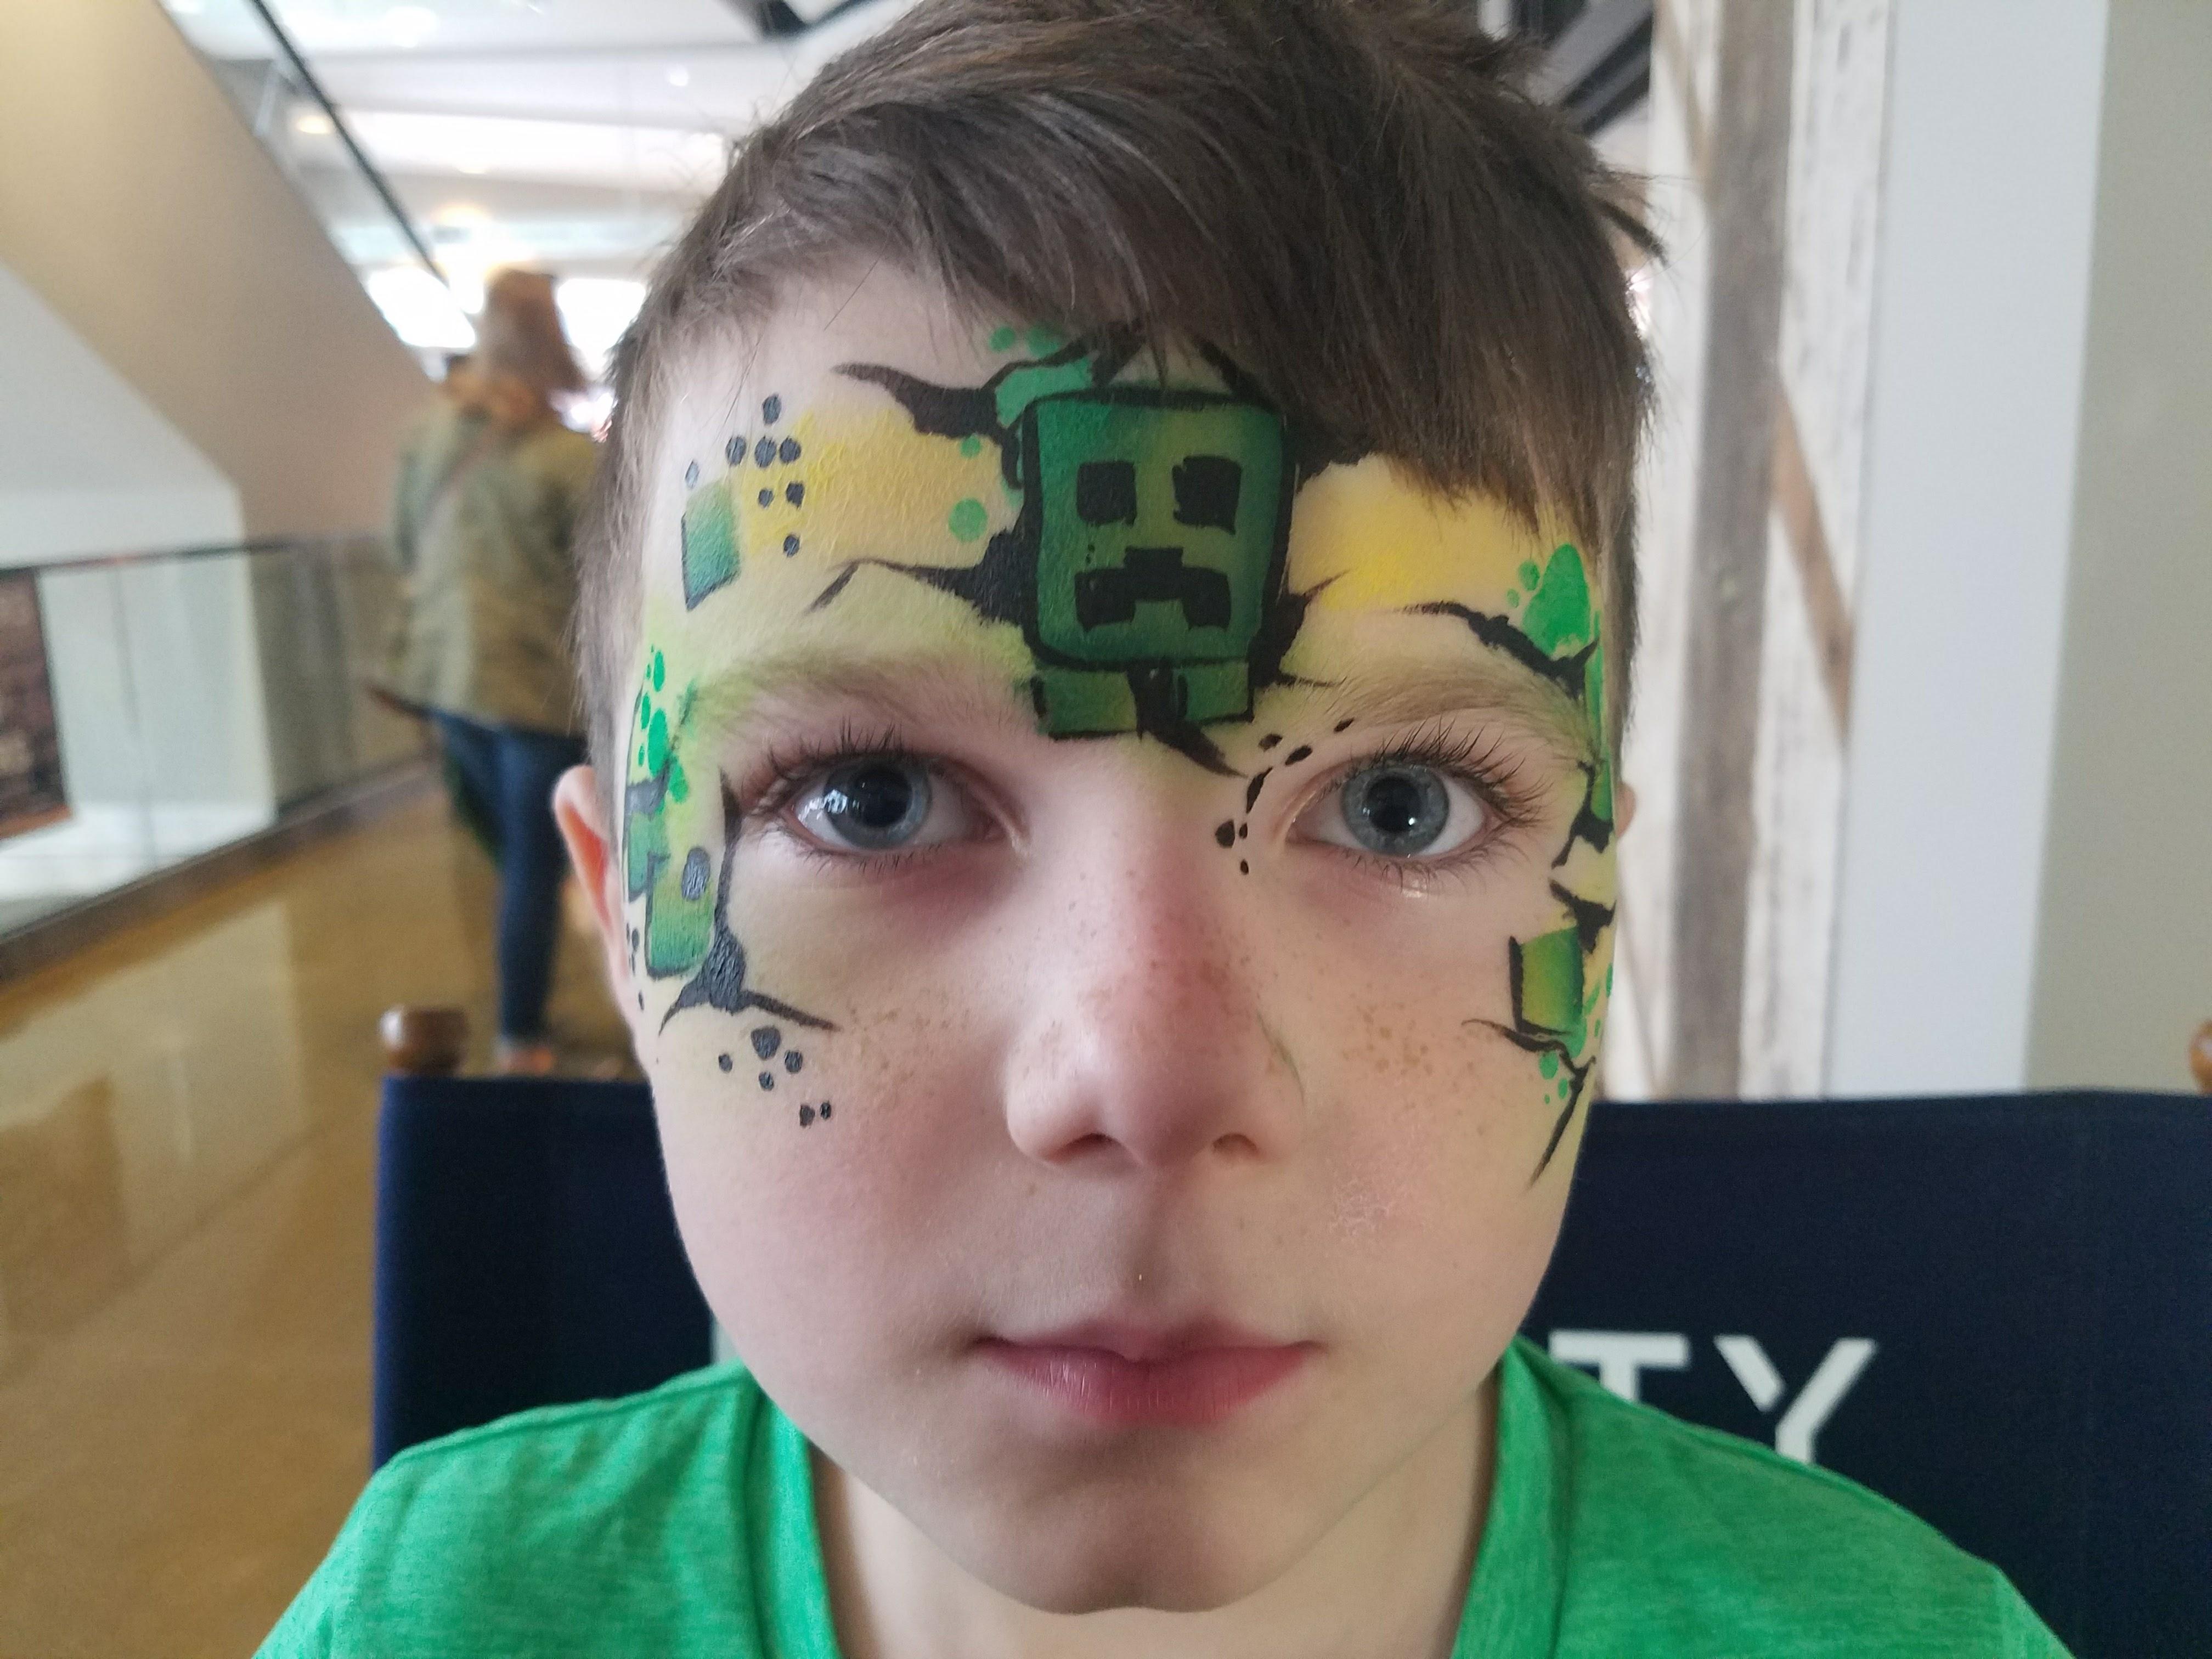 Minecraft Creeper face